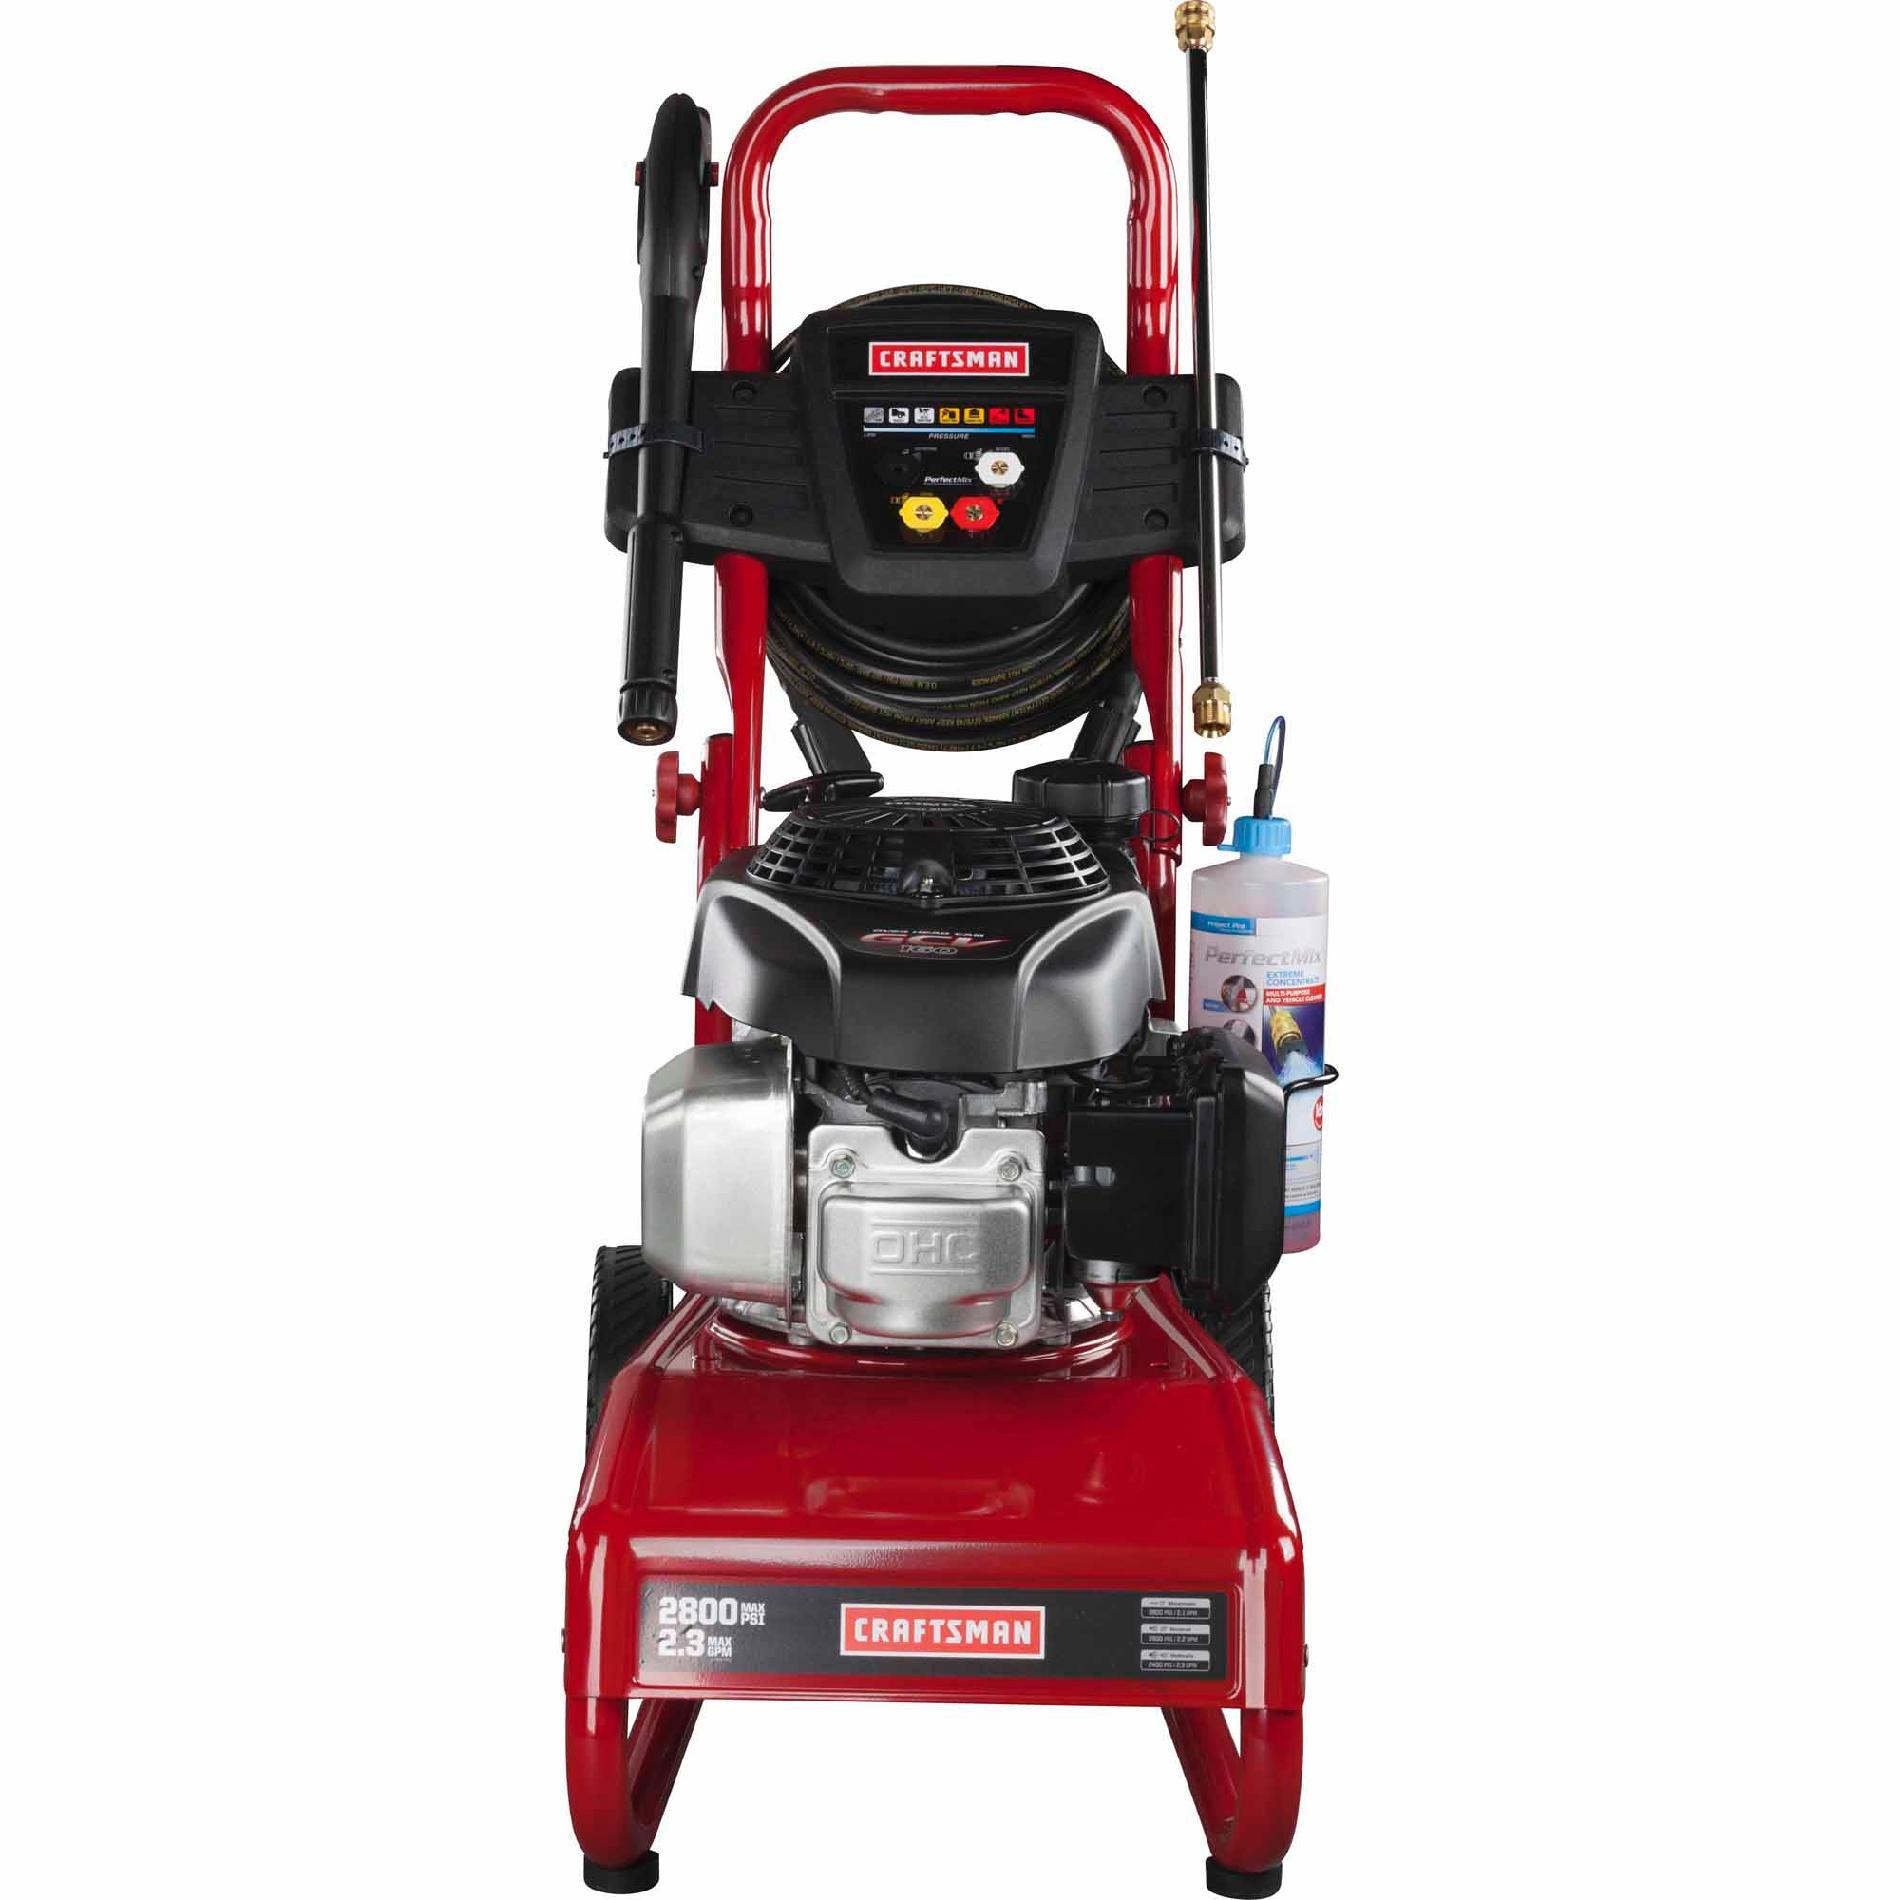 Craftsman 2800psi 2.3 GPM Gas Powered Pressure Washer